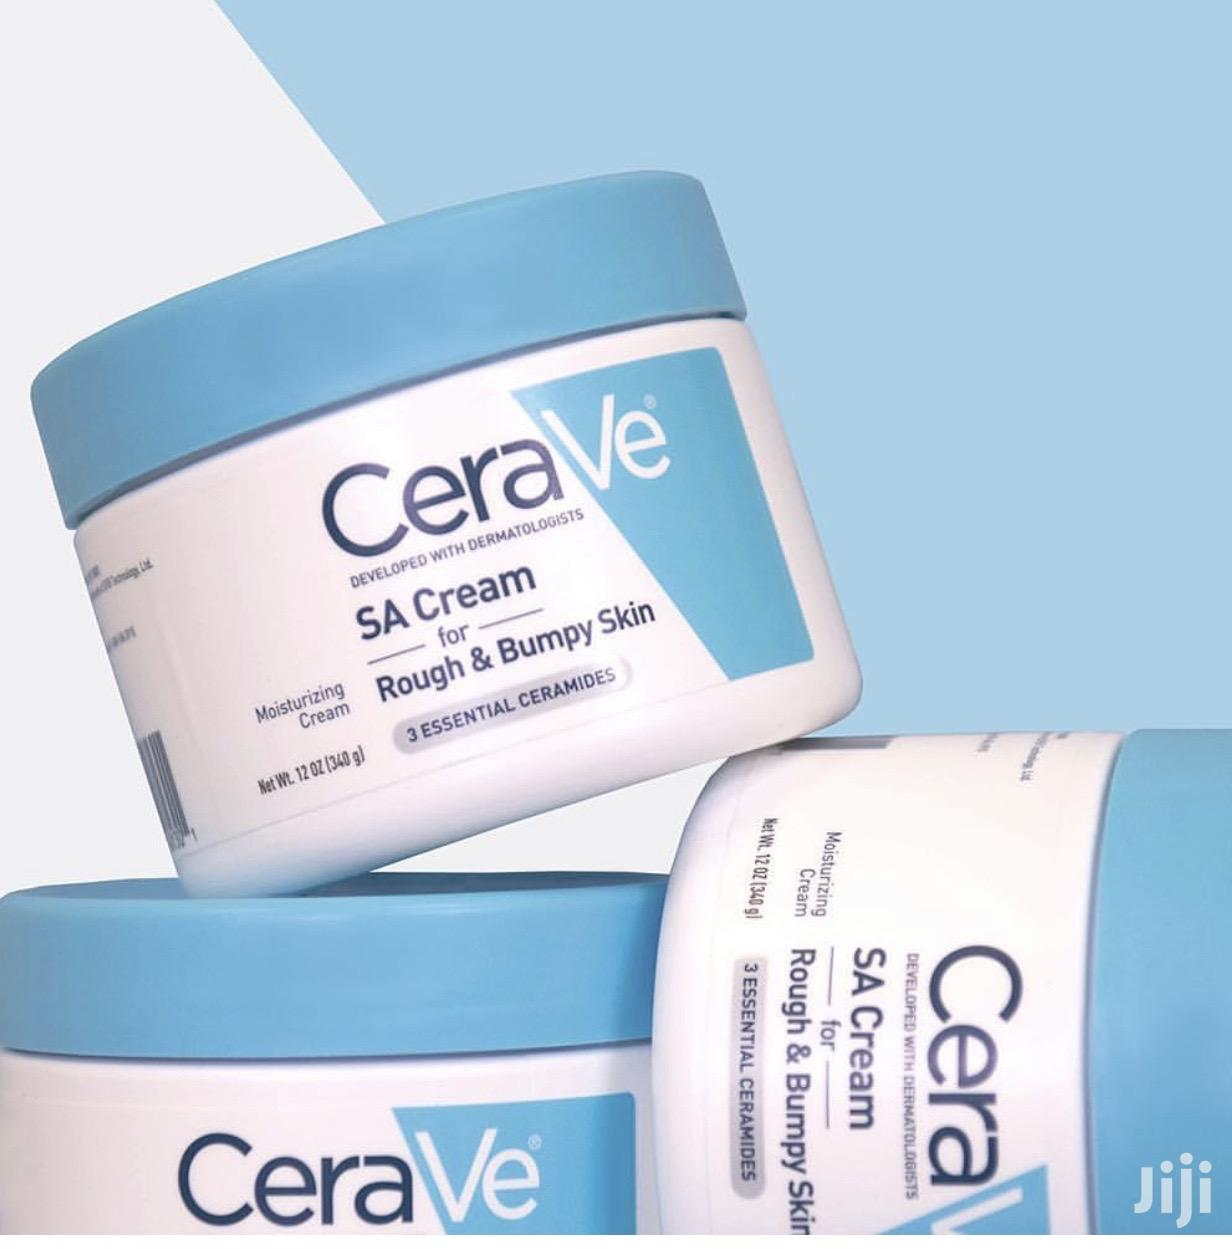 Cerave SA Cream | Renewing Salicylic Acid Body Cream